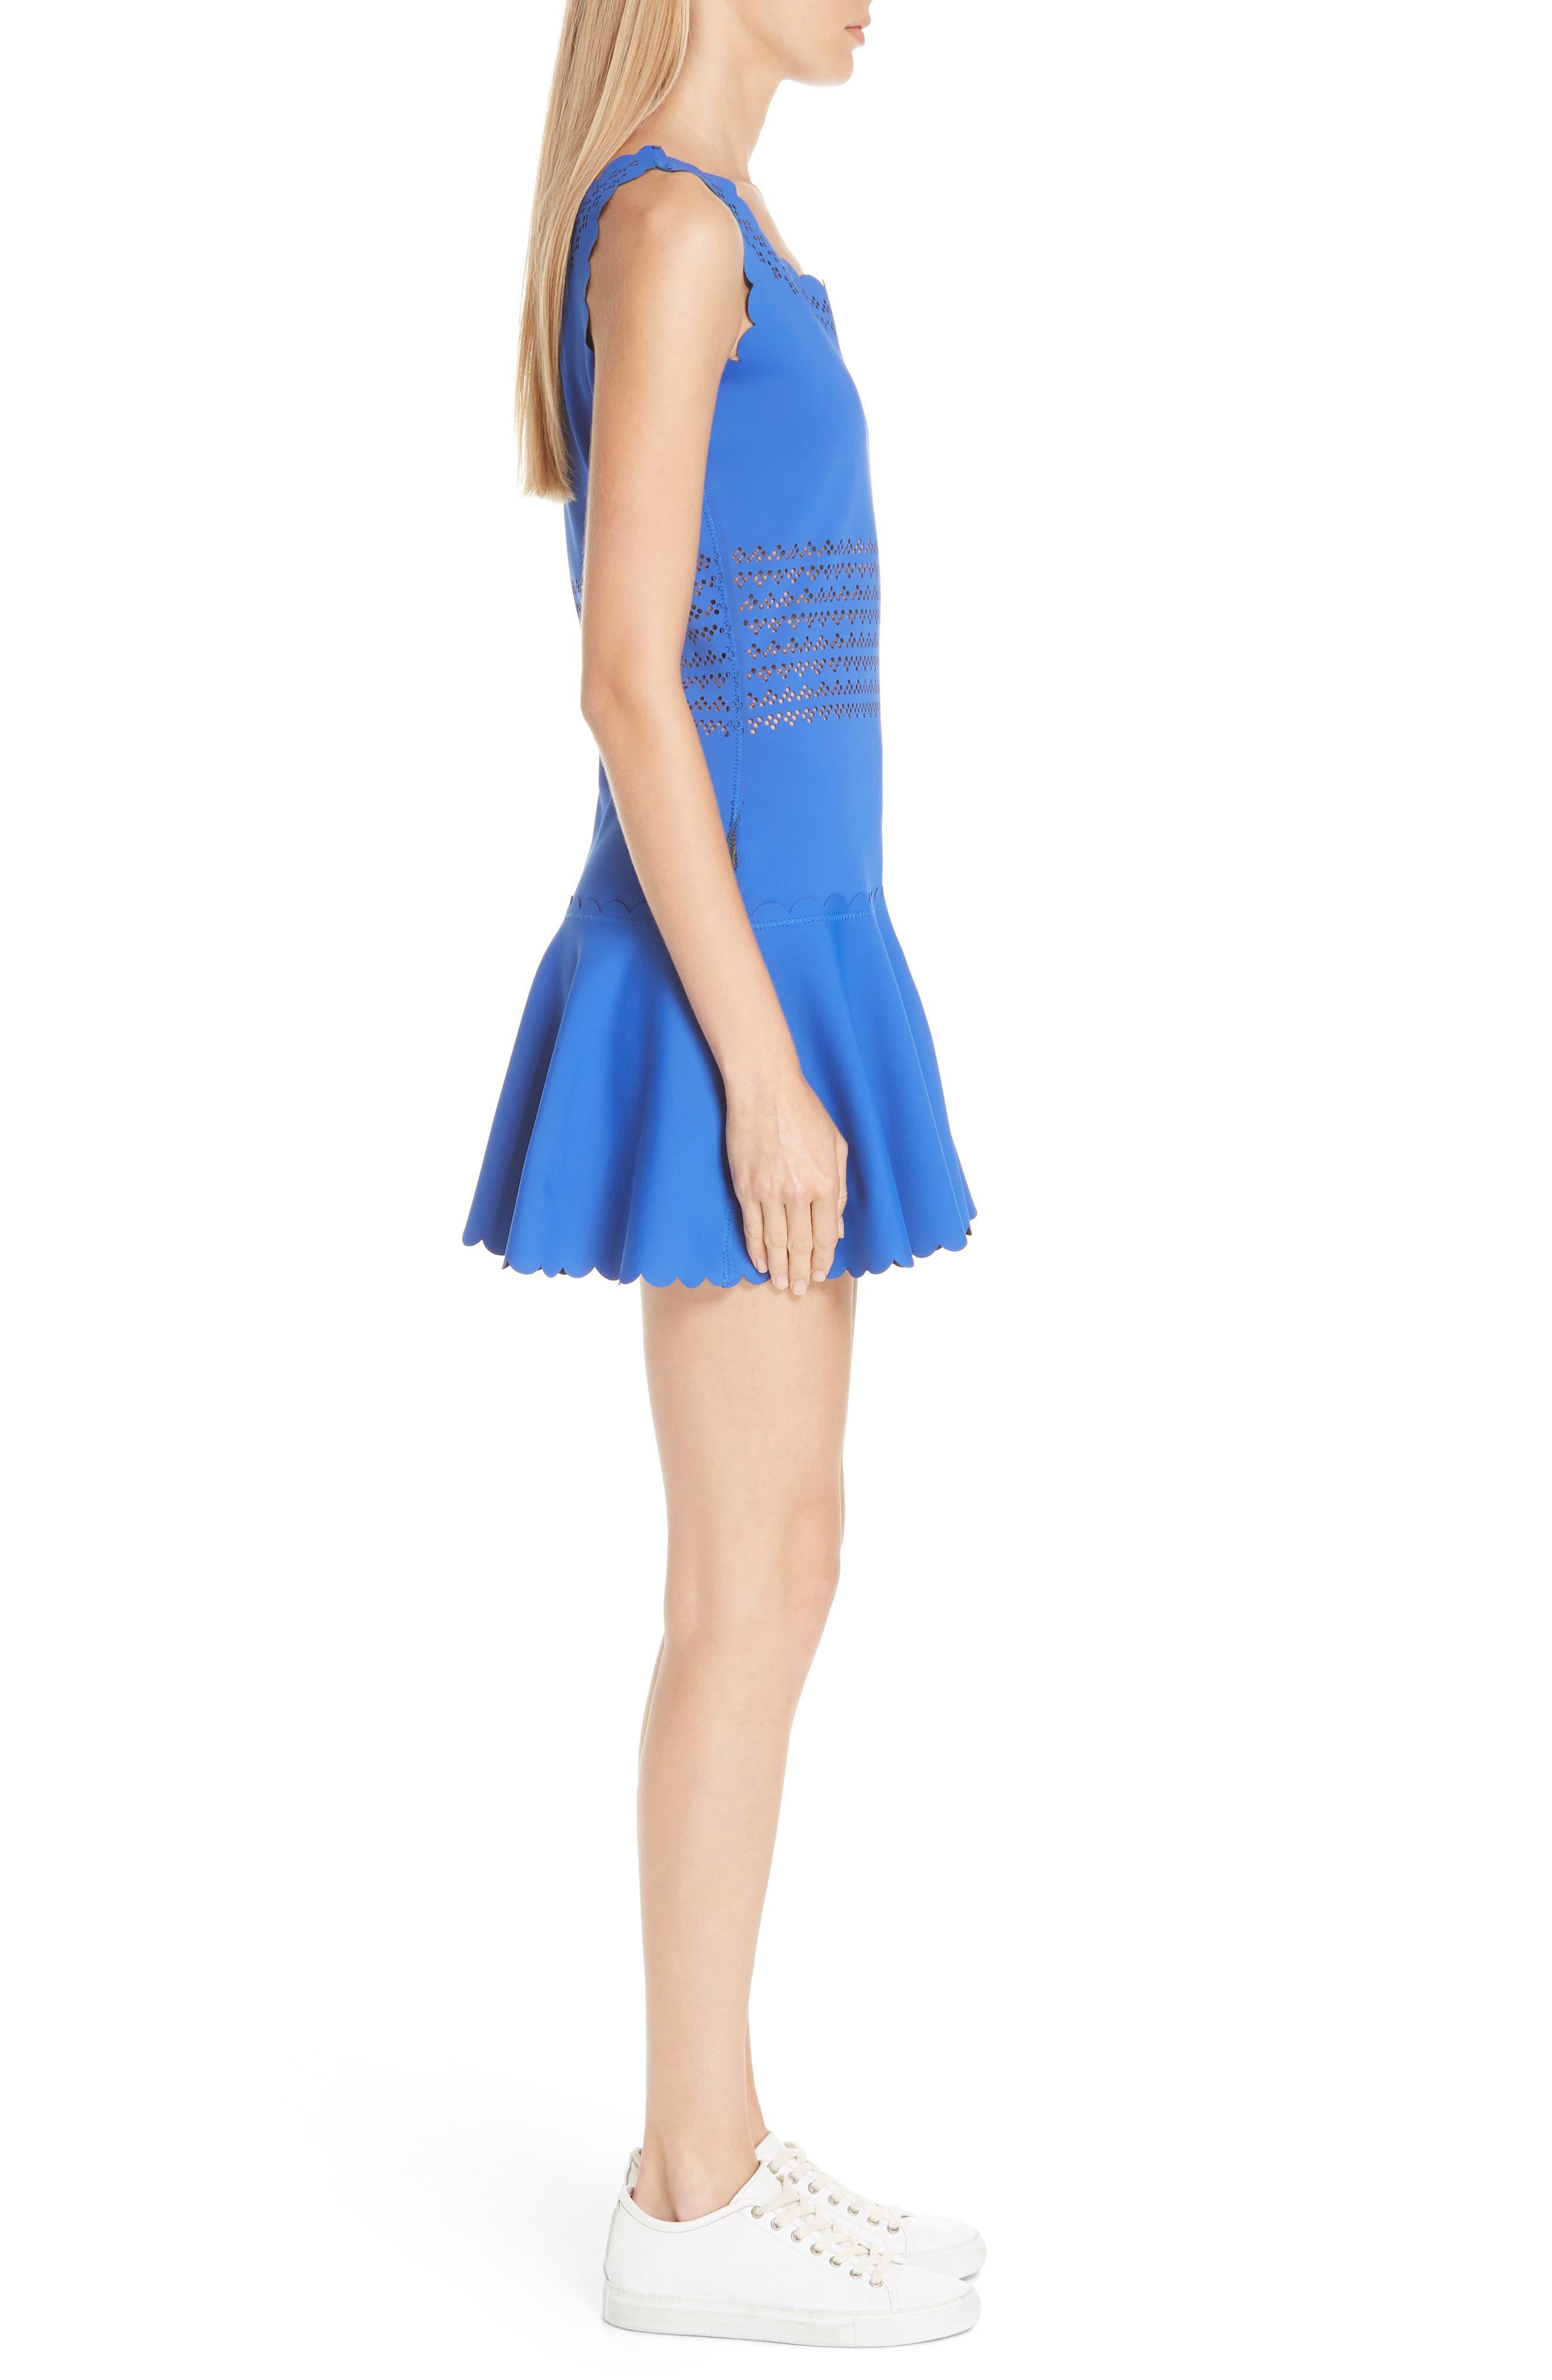 Center Court Tennis Dress,                             Alternate thumbnail 4, color,                             BLUE